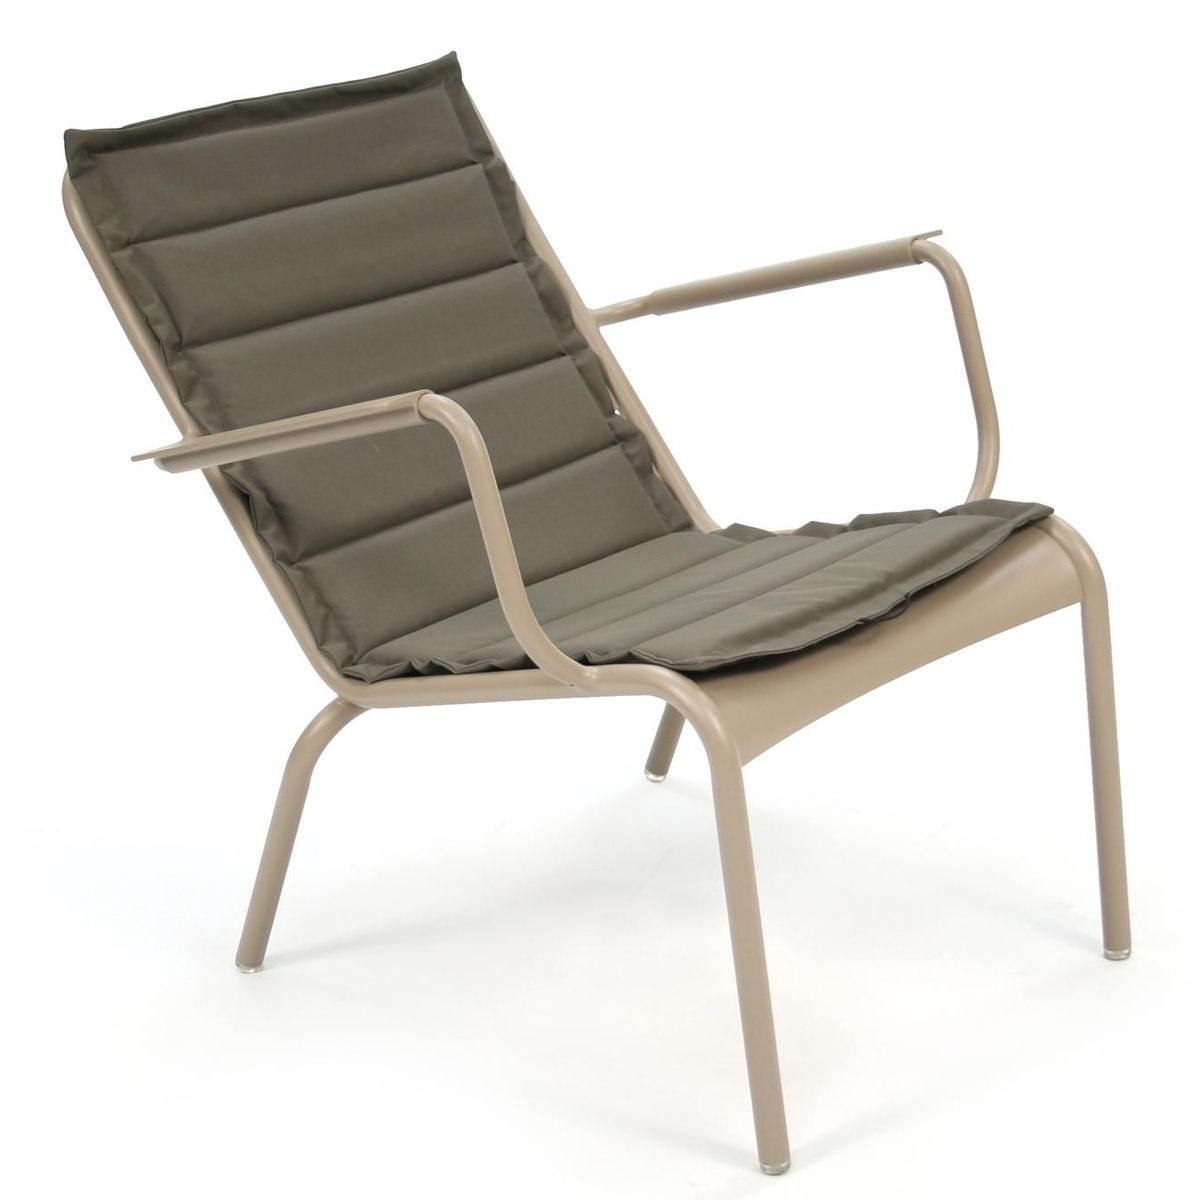 Luxembourg coussin pour fauteuil bas fermob coussins for Coussins pour fauteuil de jardin